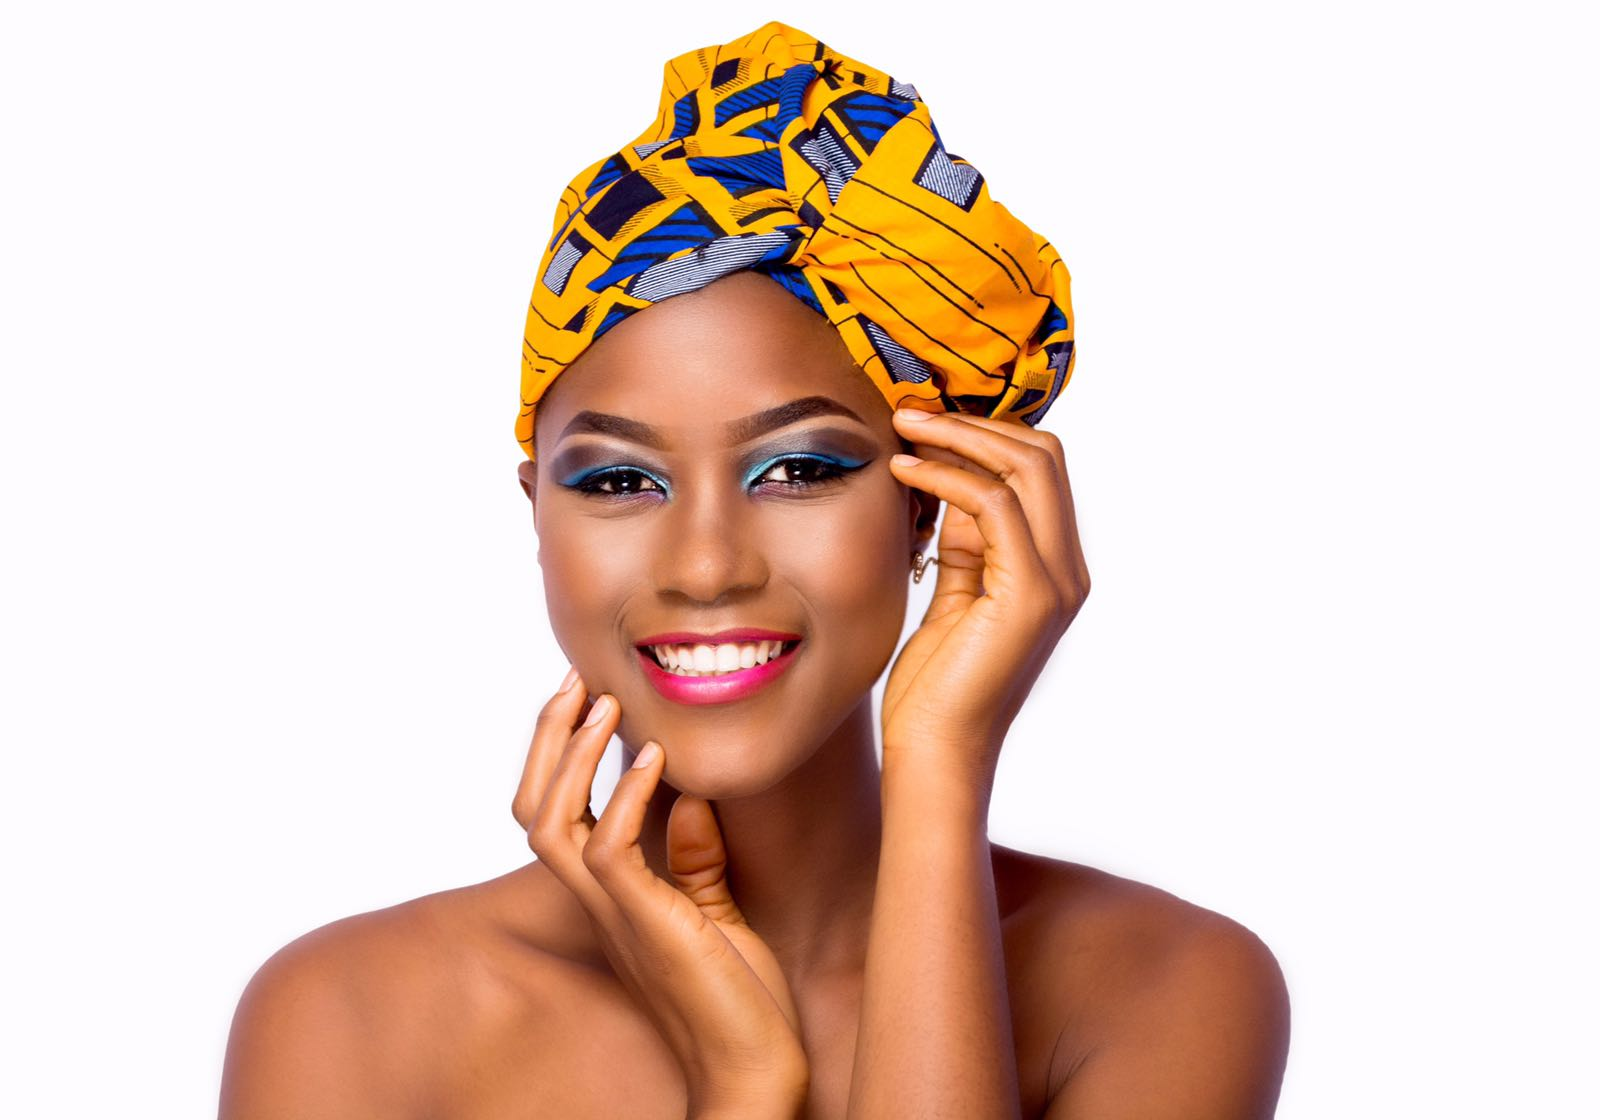 Niki Heat Model Audrey Monkam Crowned Miss Beach 2017 BEST BEACHES IN CAMEROON